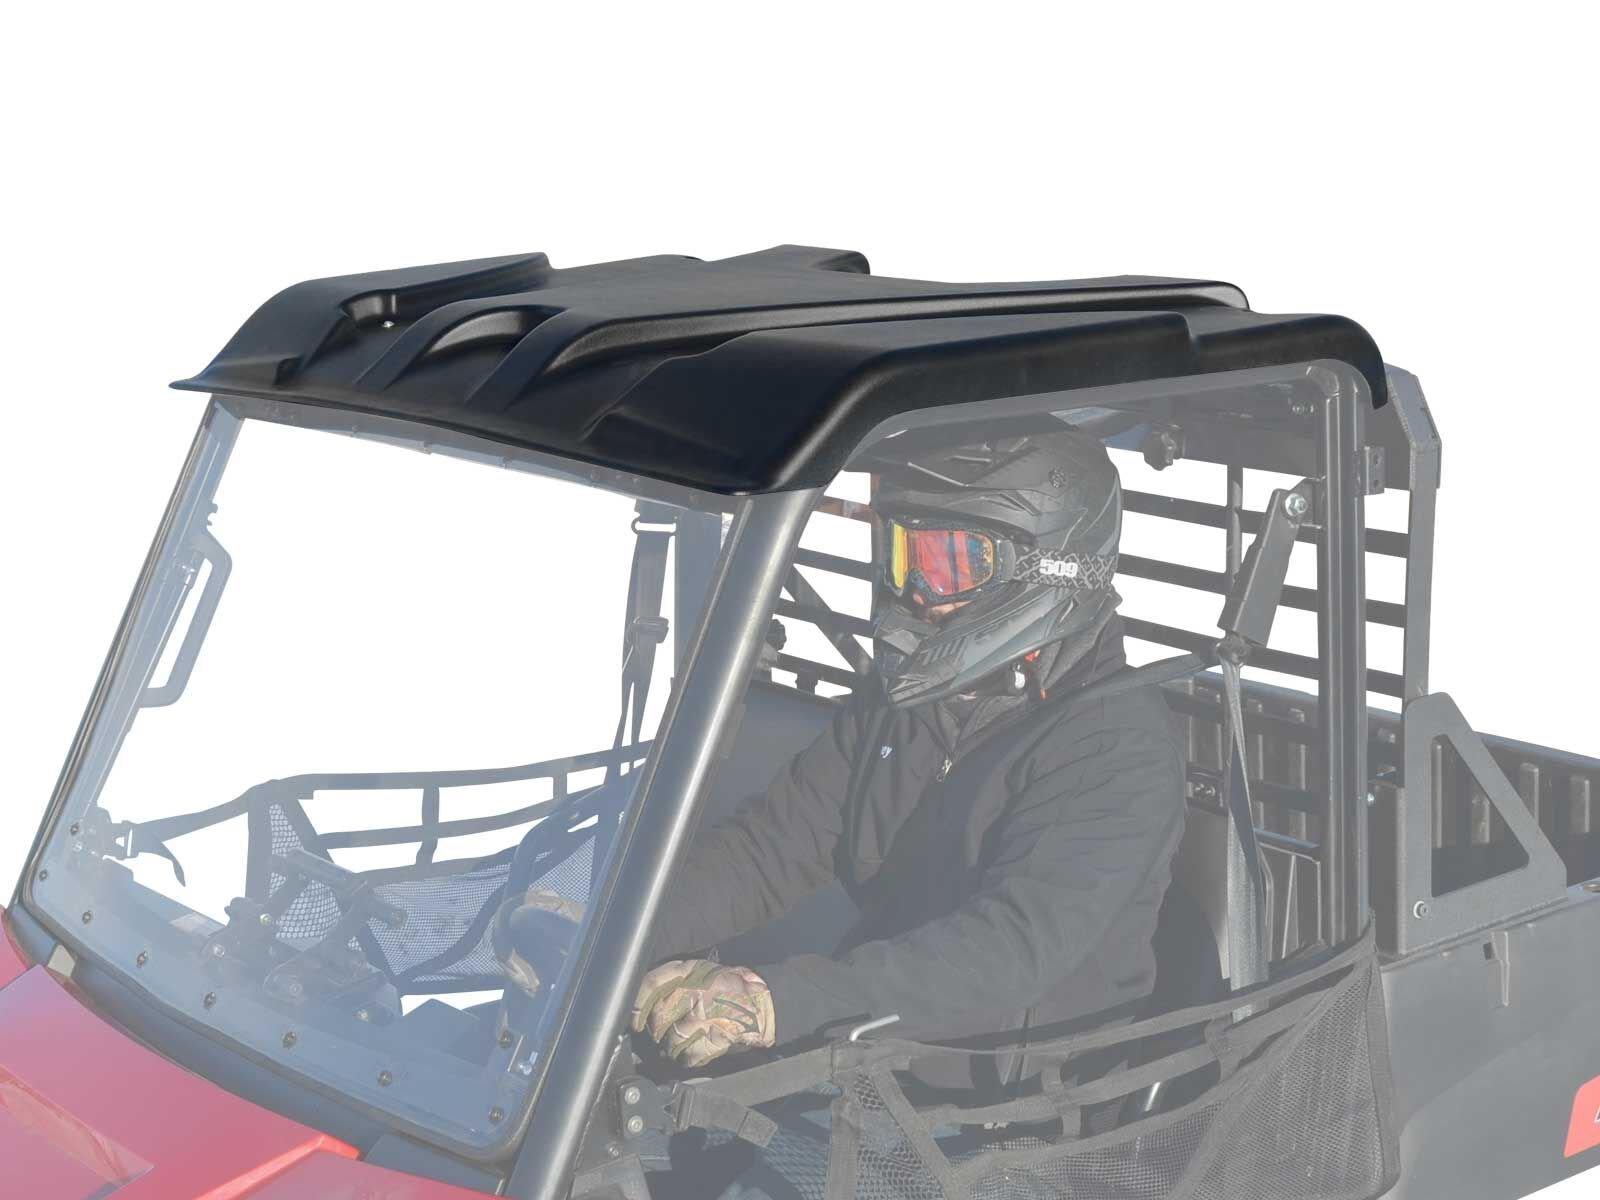 SuperATV Polaris Ranger Midsize 570 / EV/ETX Plastic Roof - (2015+) - Easy to Install!